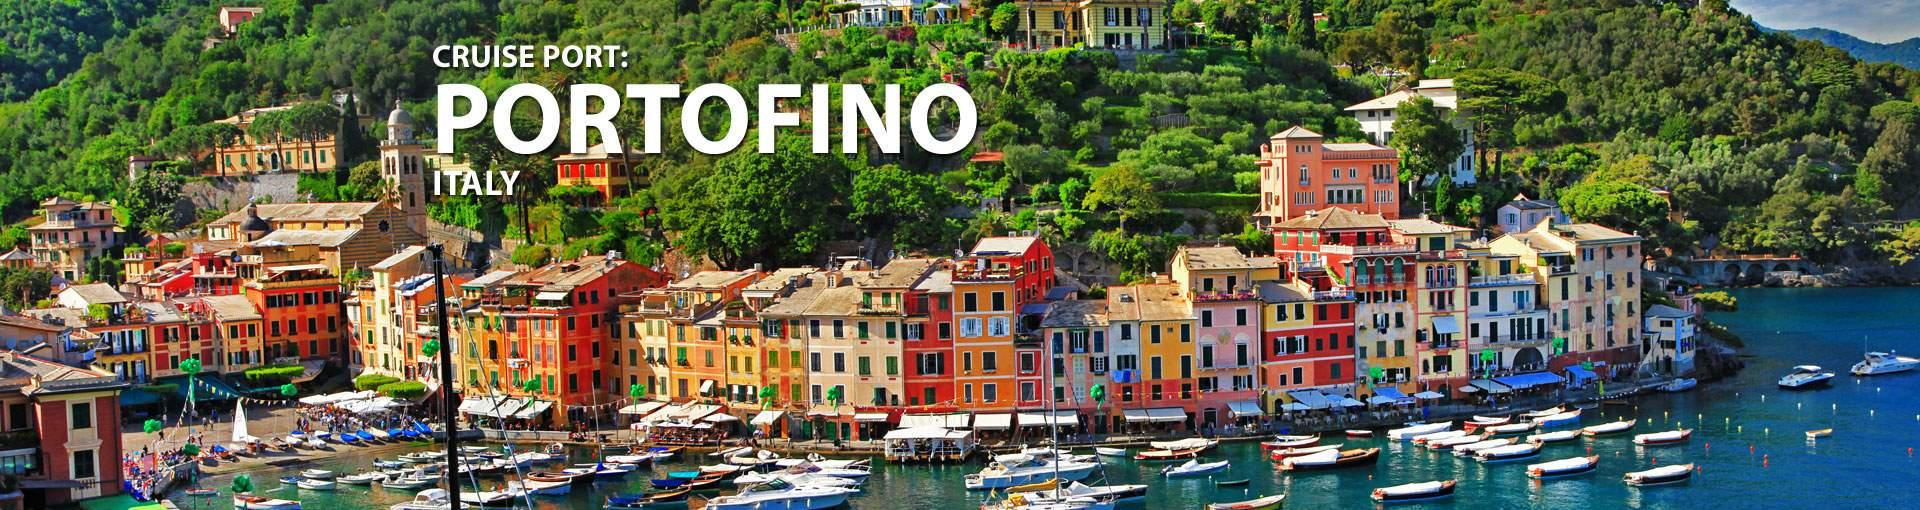 Cruises to Portofino, Italy